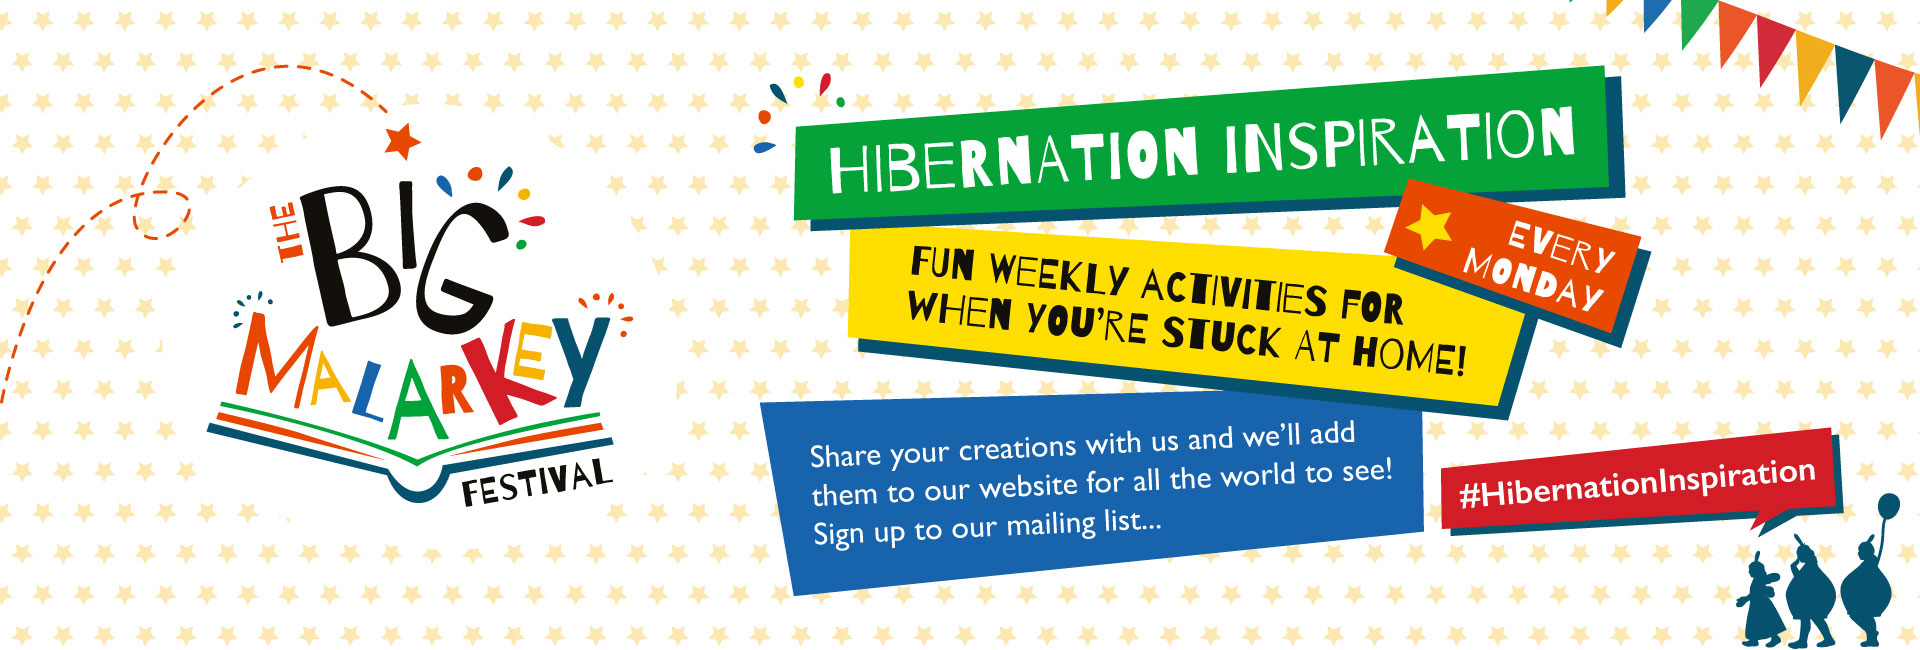 HIBERNATION INSPIRATION